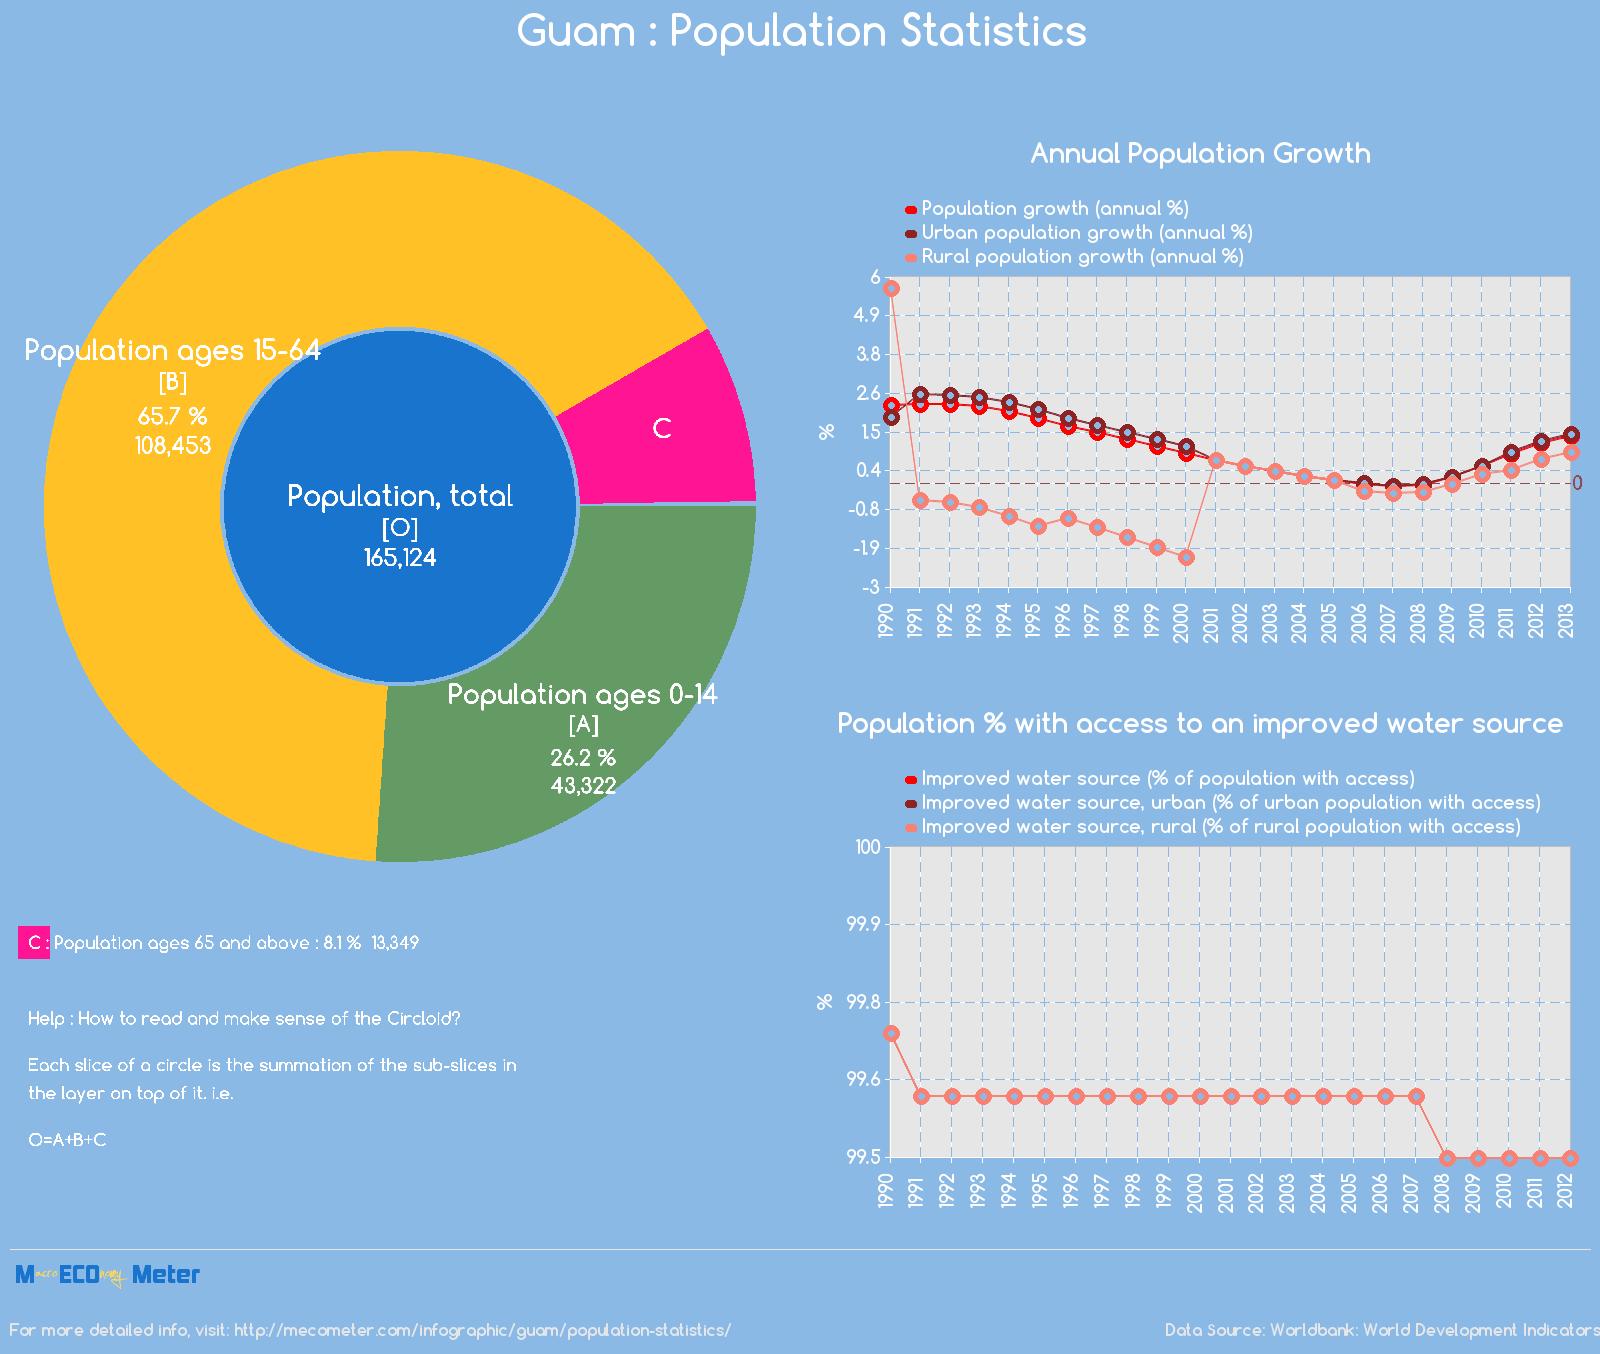 Guam : Population Statistics